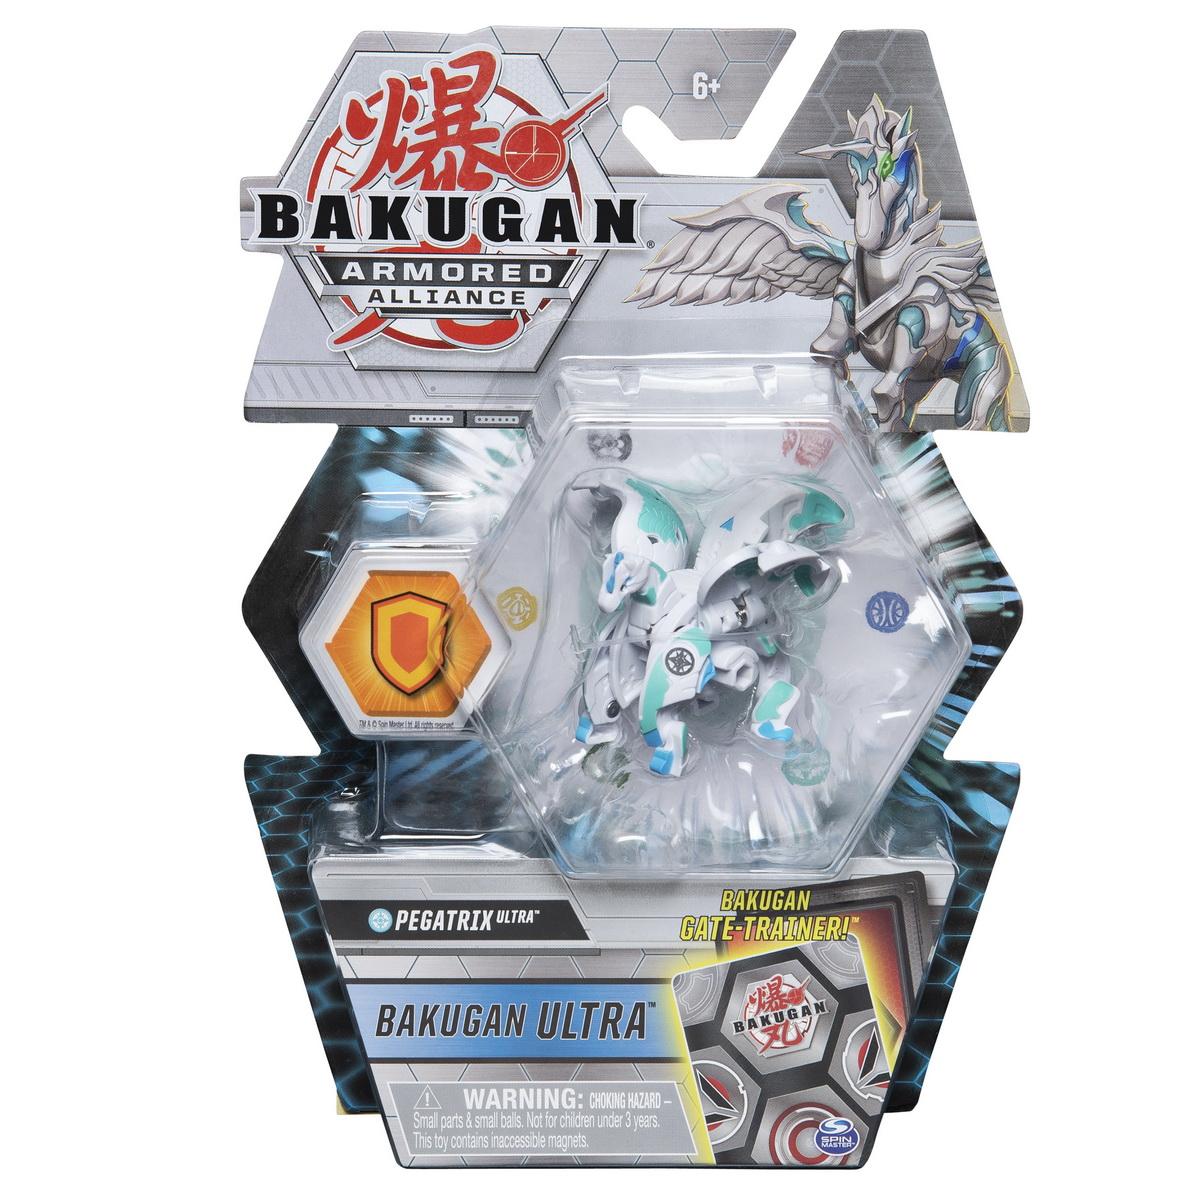 Bakugan S2 Bila Ultra Pegatrix Cu Card Baku-gear